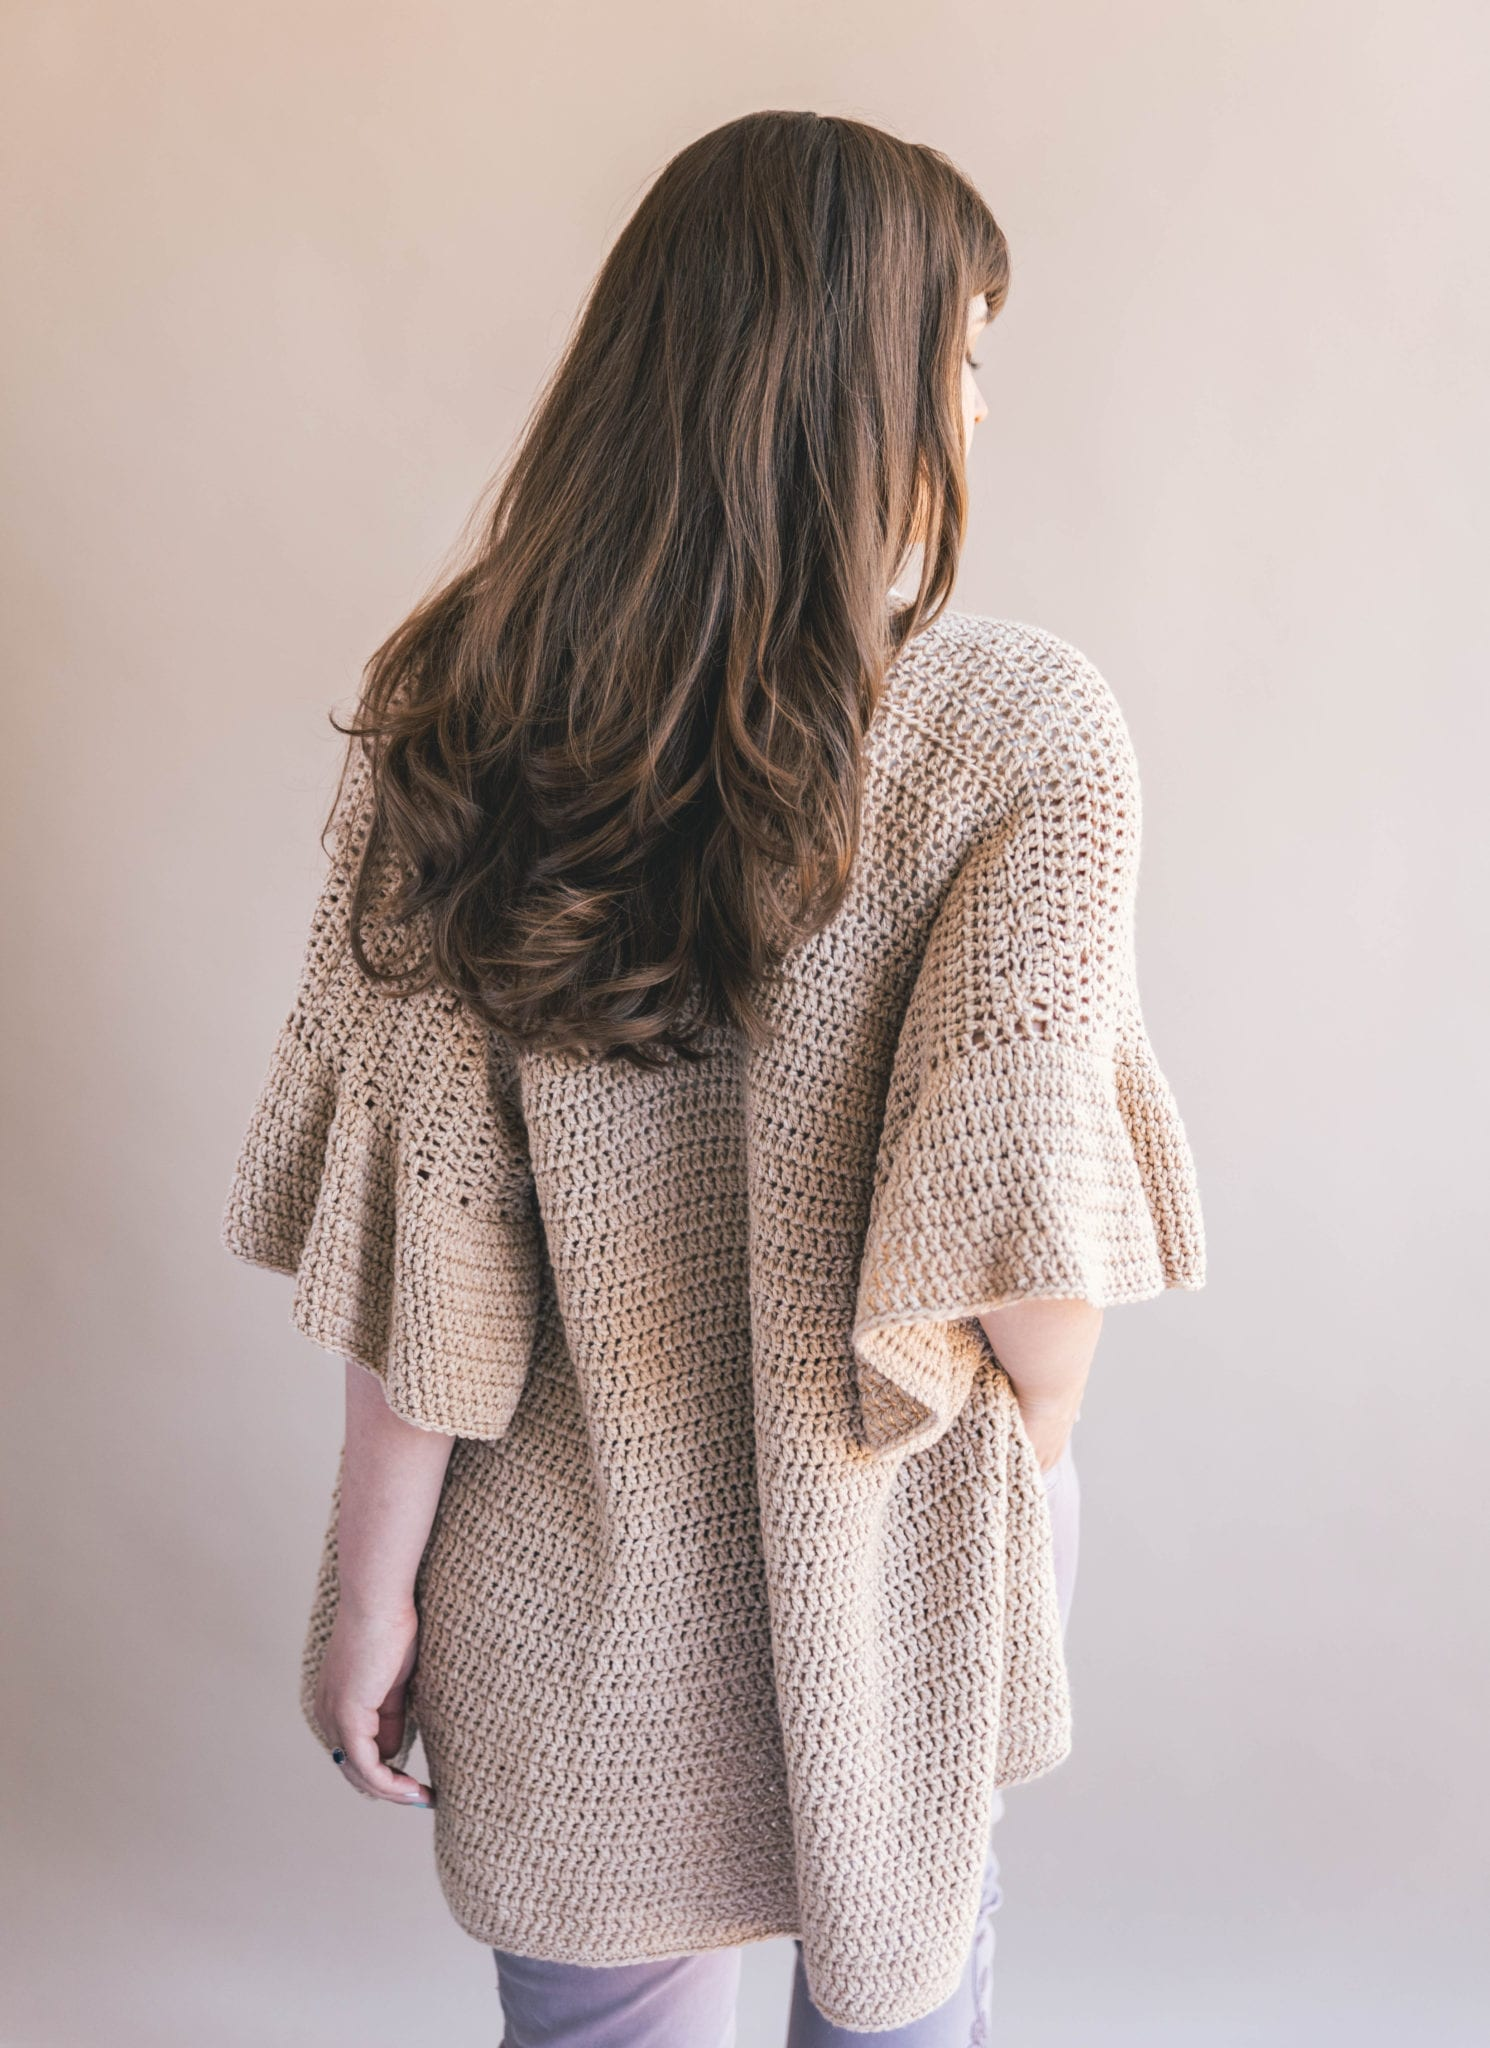 Crochet Ruffle Sleeve Cardigan.